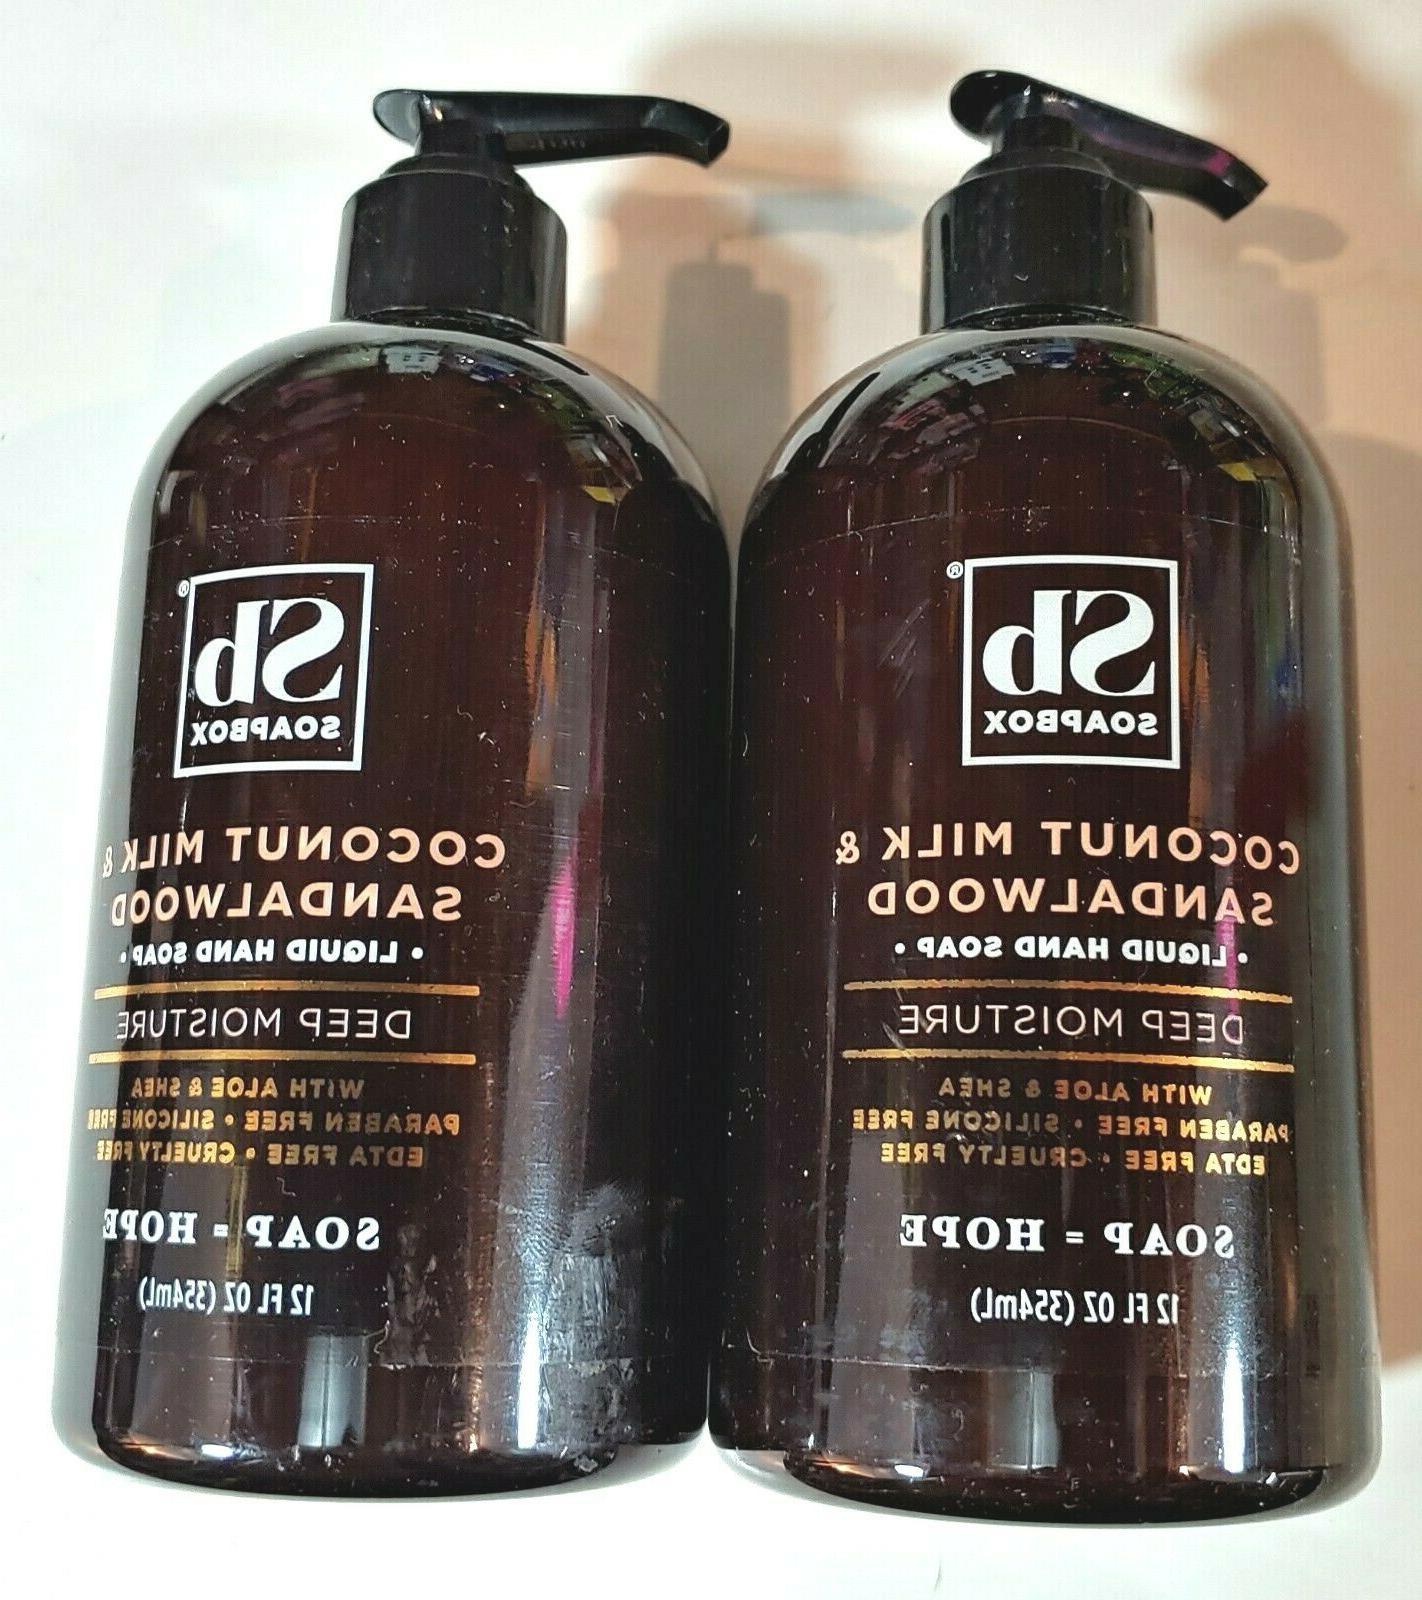 Soapbox Coconut Milk & Sandalwood Liquid Hand Soap, 12 fl oz